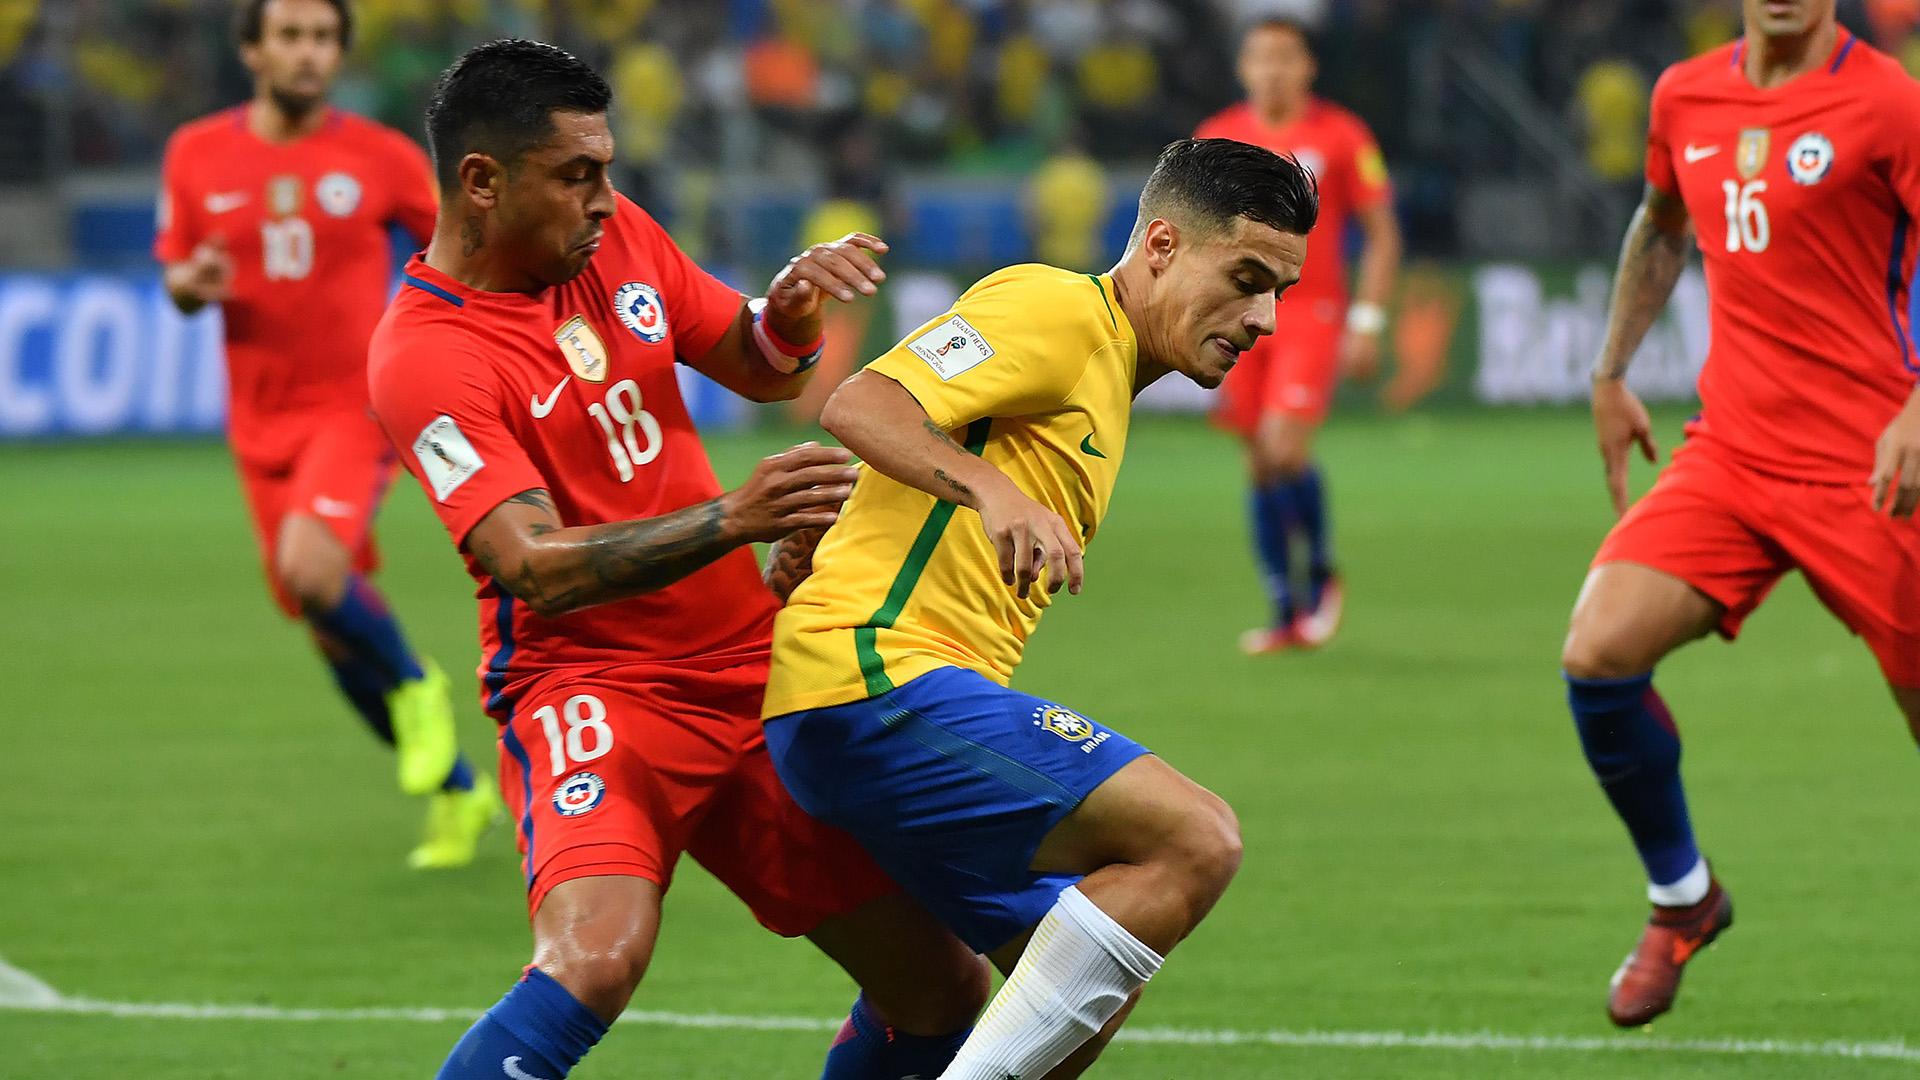 Coutinho Gonzalo Jara Brasil Chile WC Qualifiers 2018 10102017